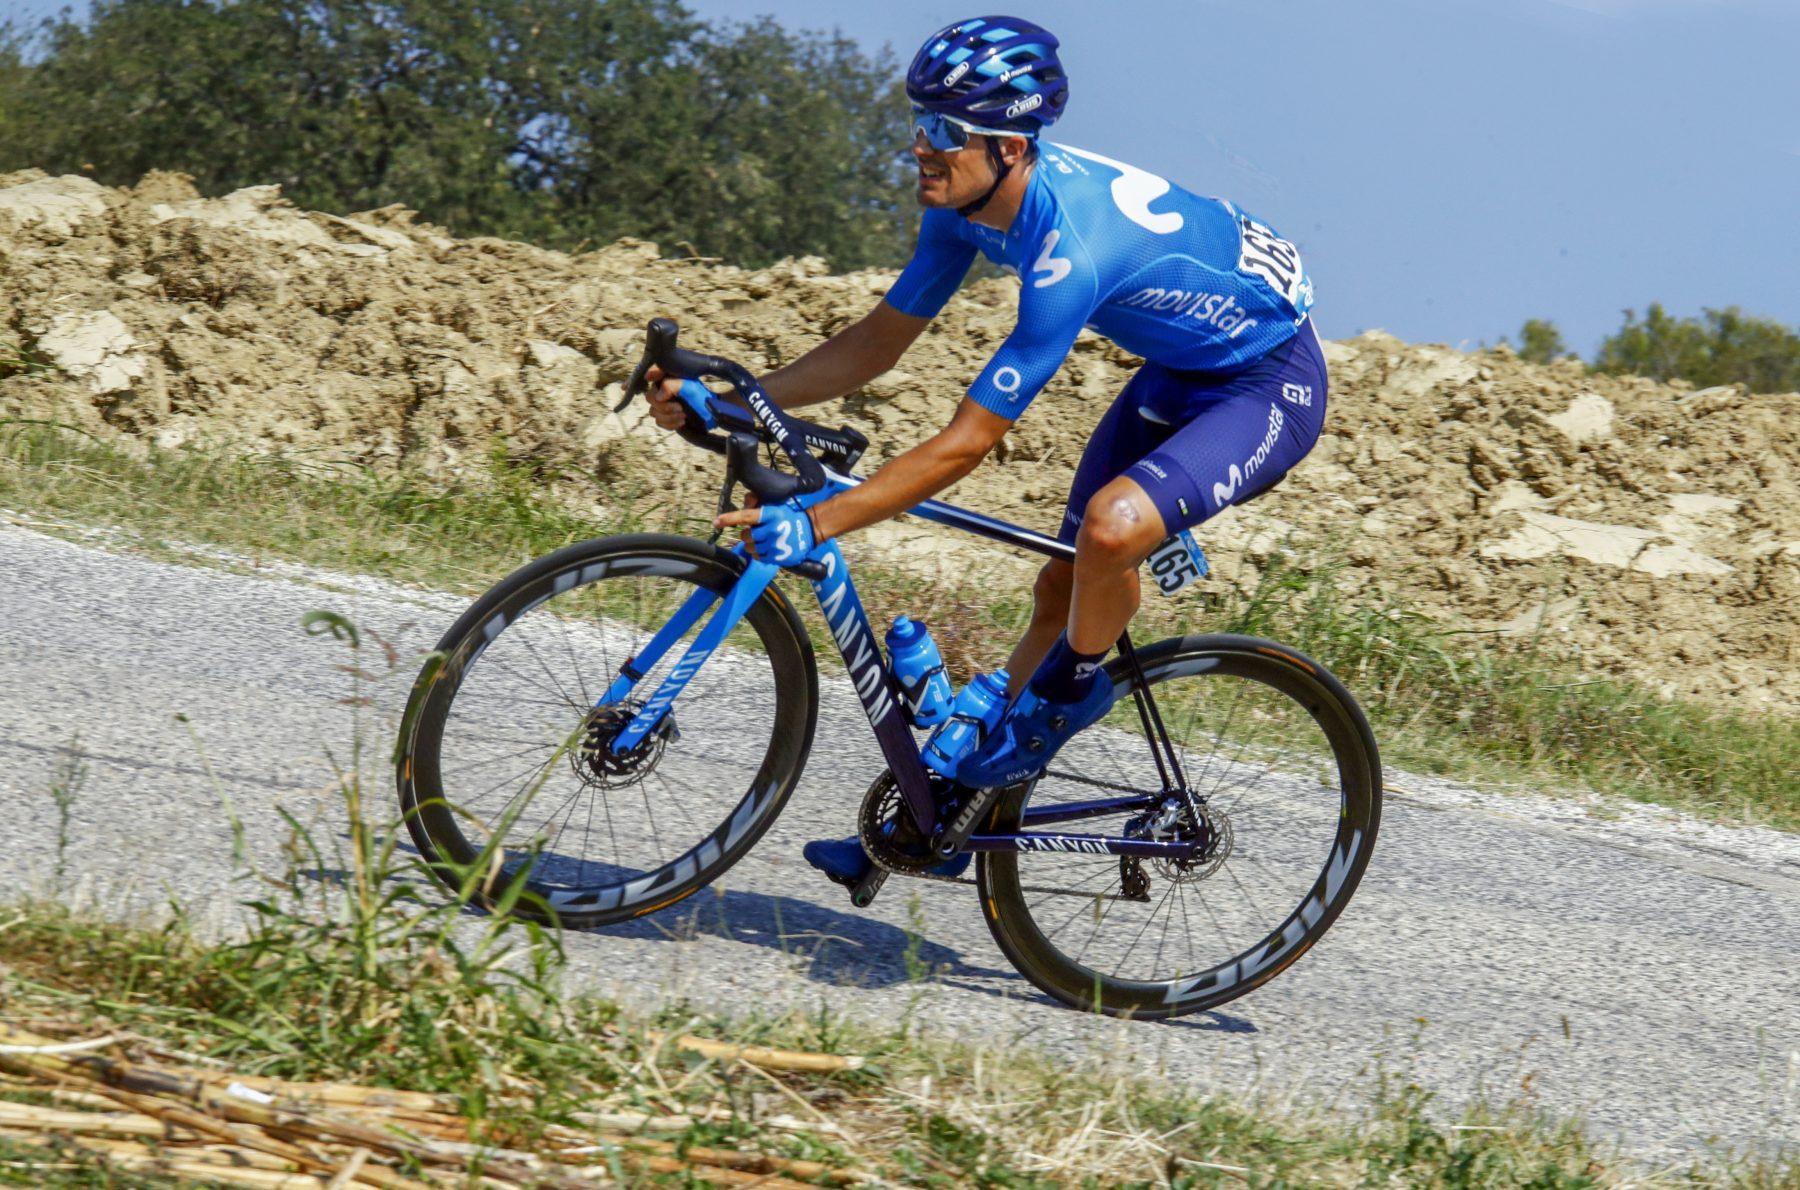 Imagen de la noticia 'Movistar Team holds Zwift ride on Saturday (6pm CET) for riders' security'